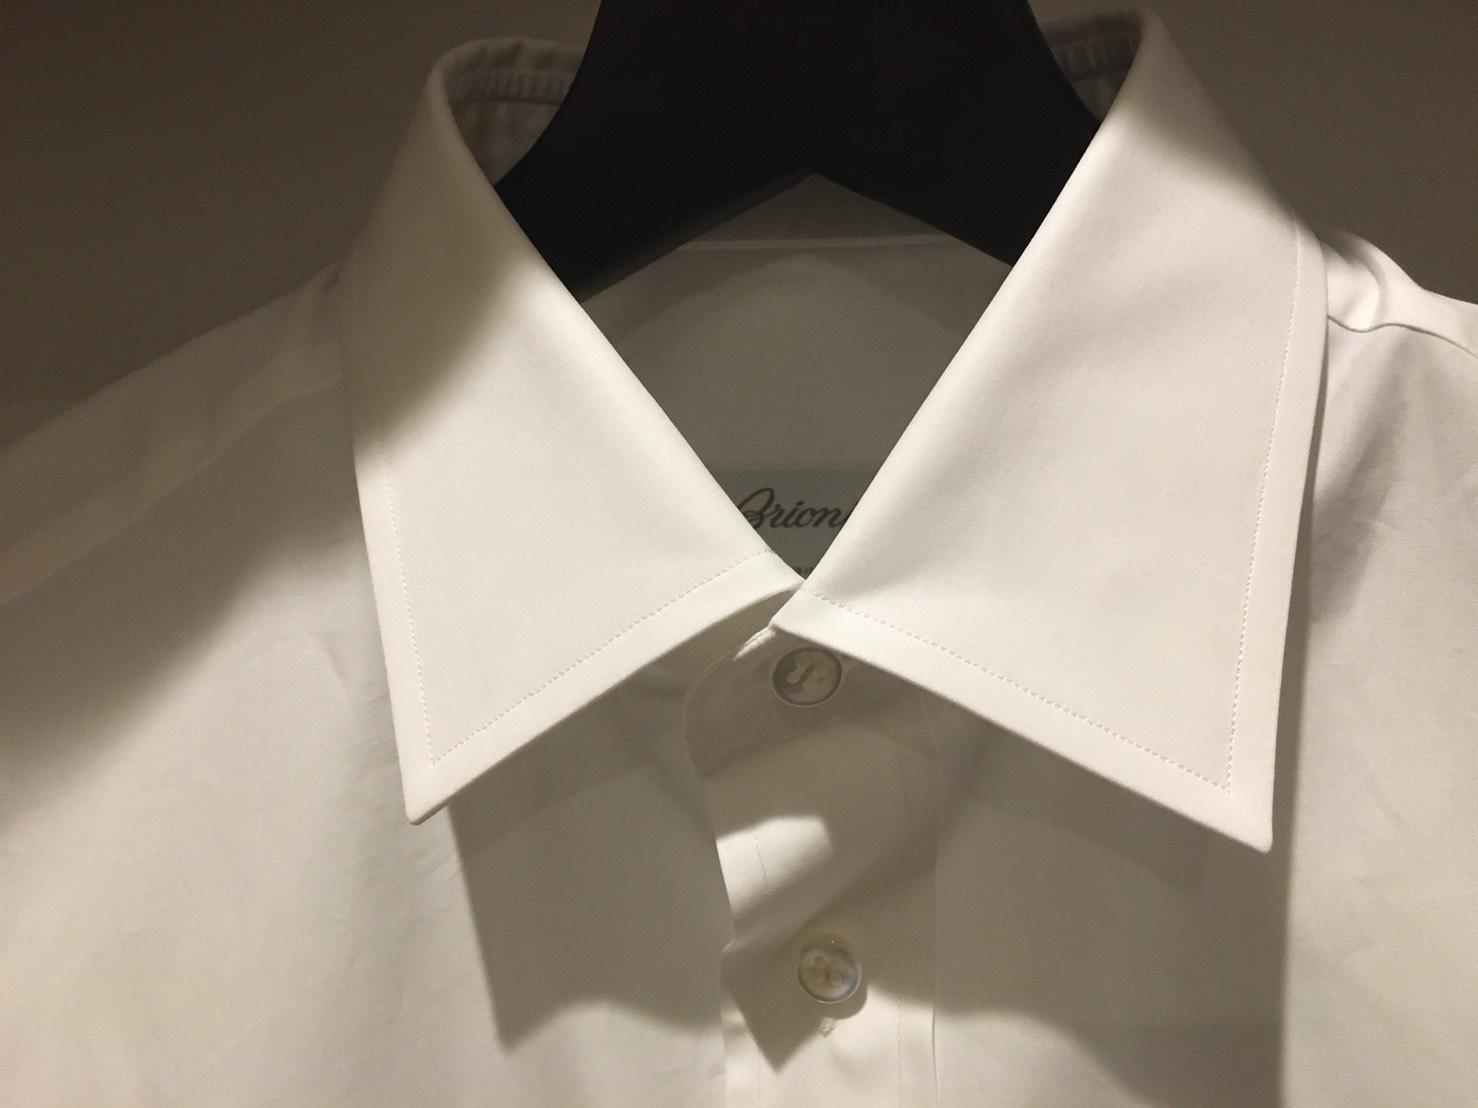 Brioni Bespoke Shirt collar